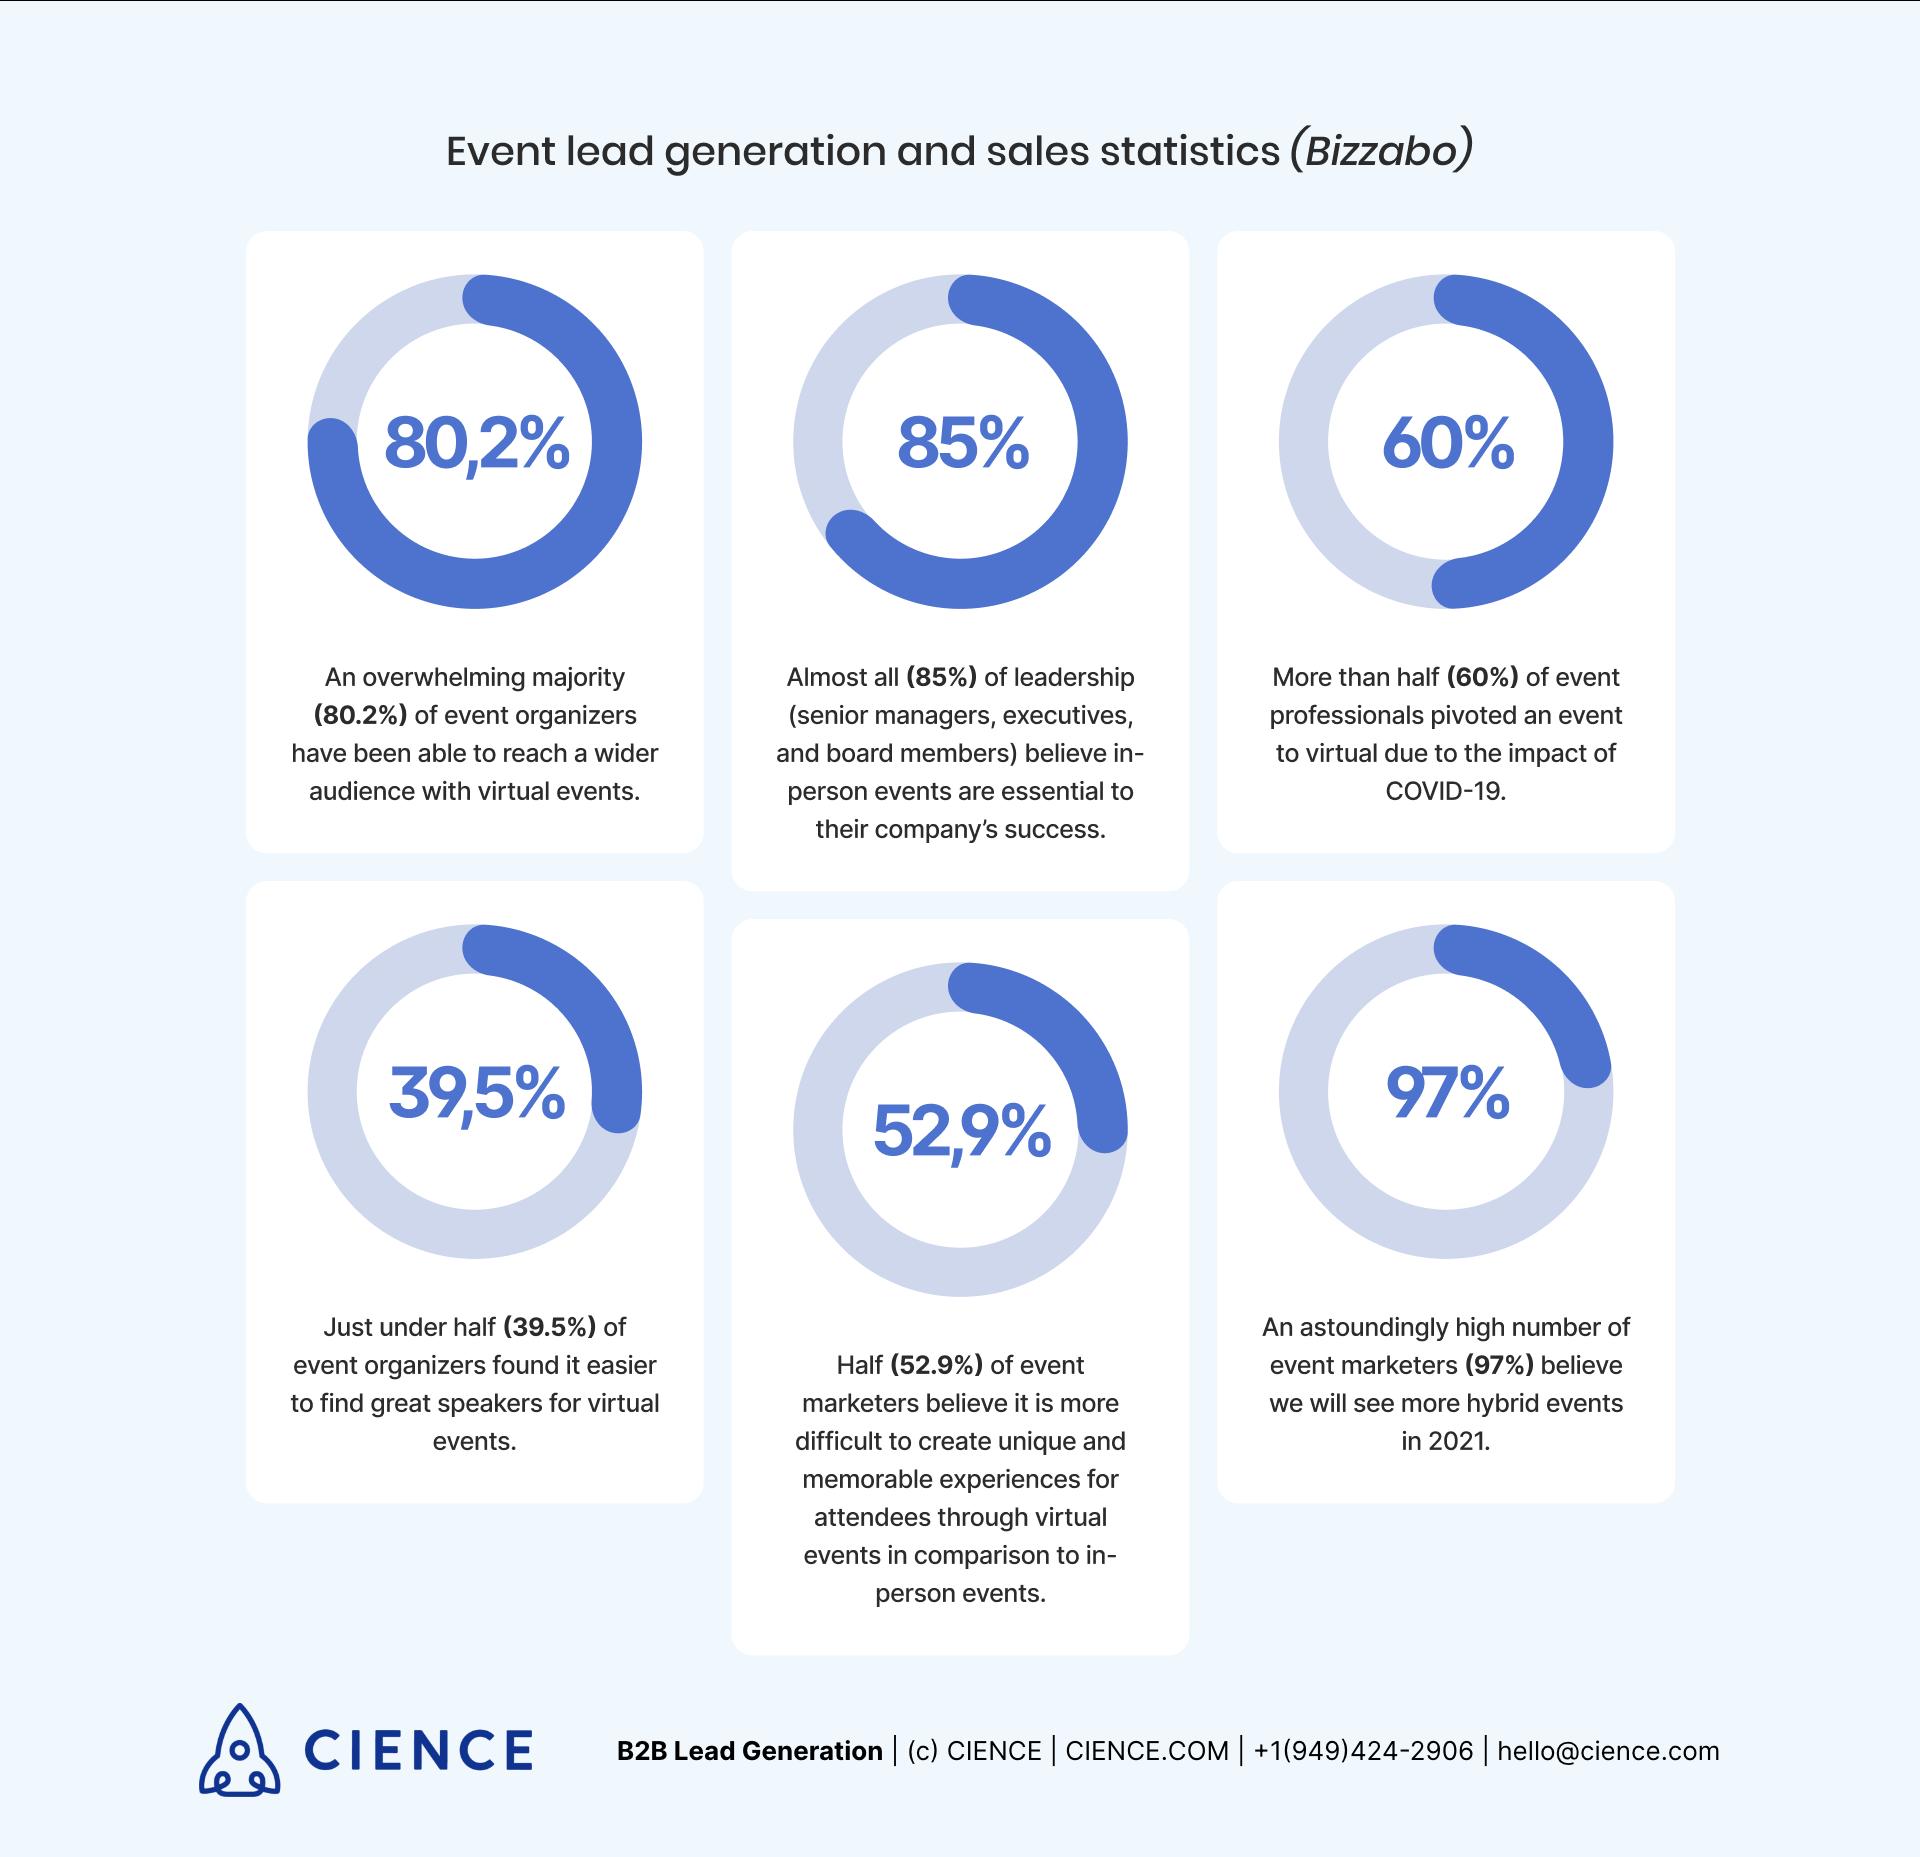 Event lead generation and sales statistics